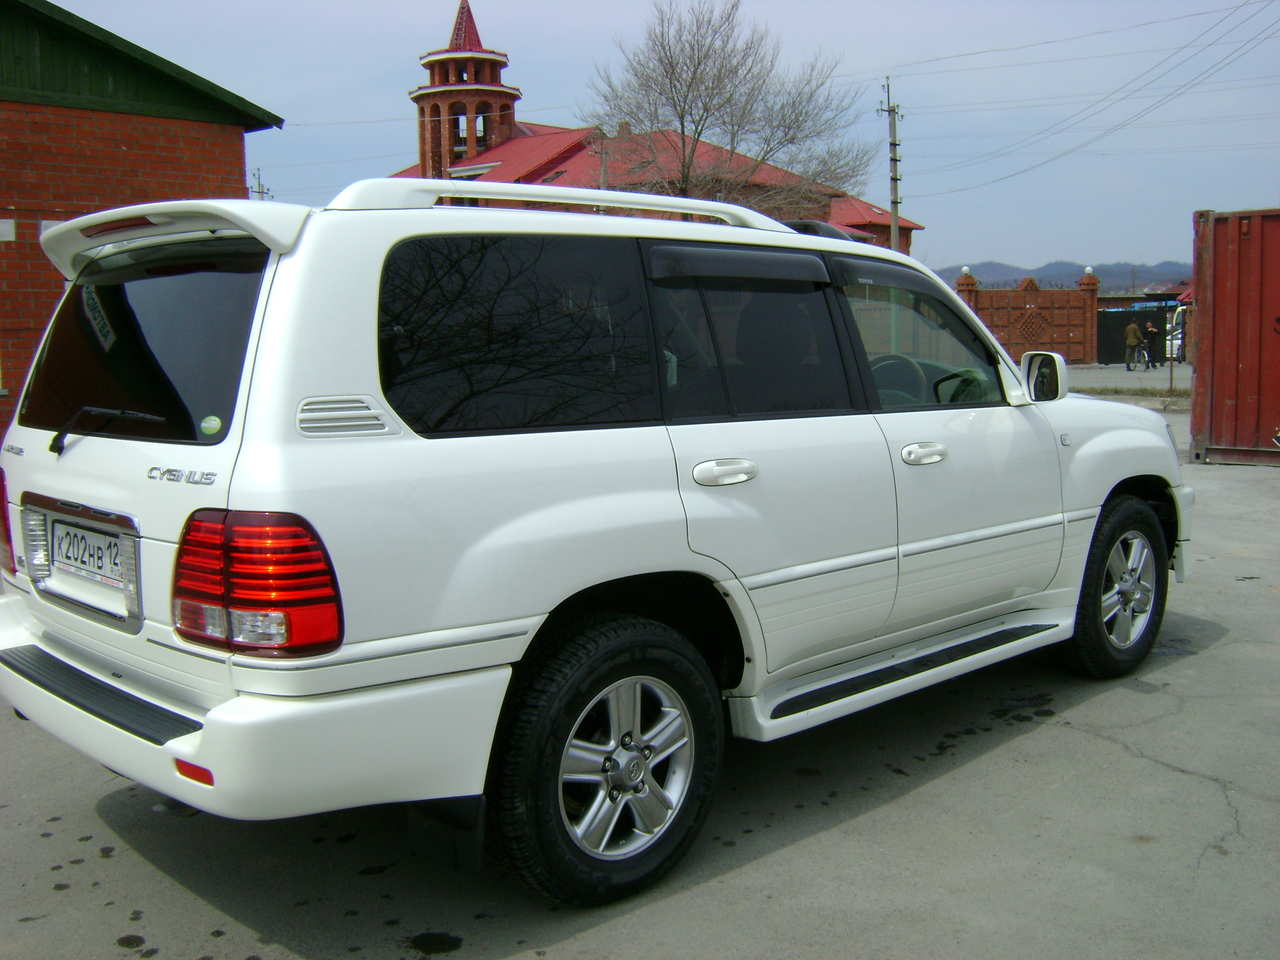 Toyota Land Cruiser 2005 Interior 2005 Toyota Land Cruiser